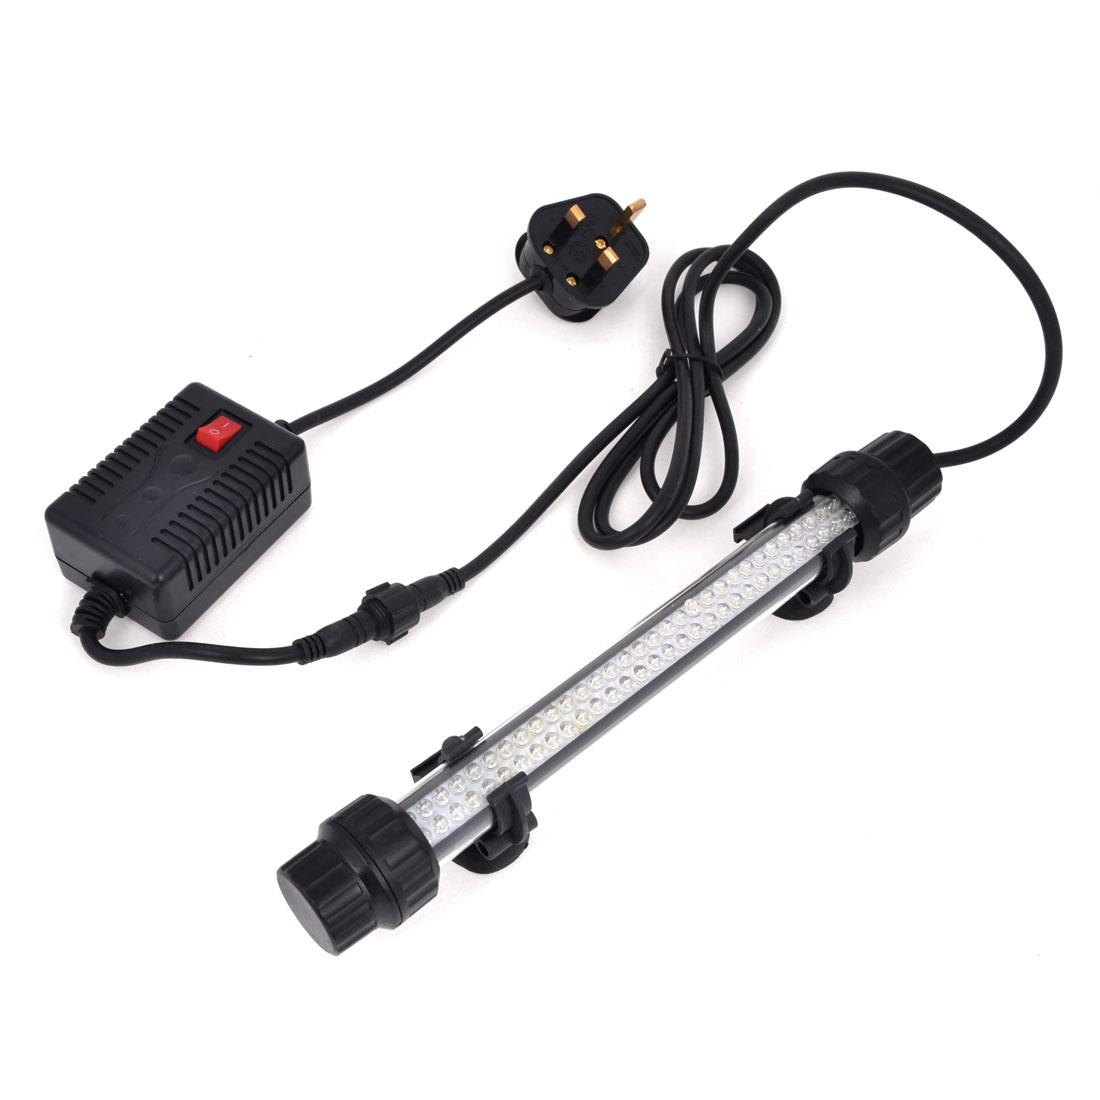 AC 220V-240V 2W Suction Cups 28cm Red Light 92 LEDs Aquarium Submersible Lamp UK Plug